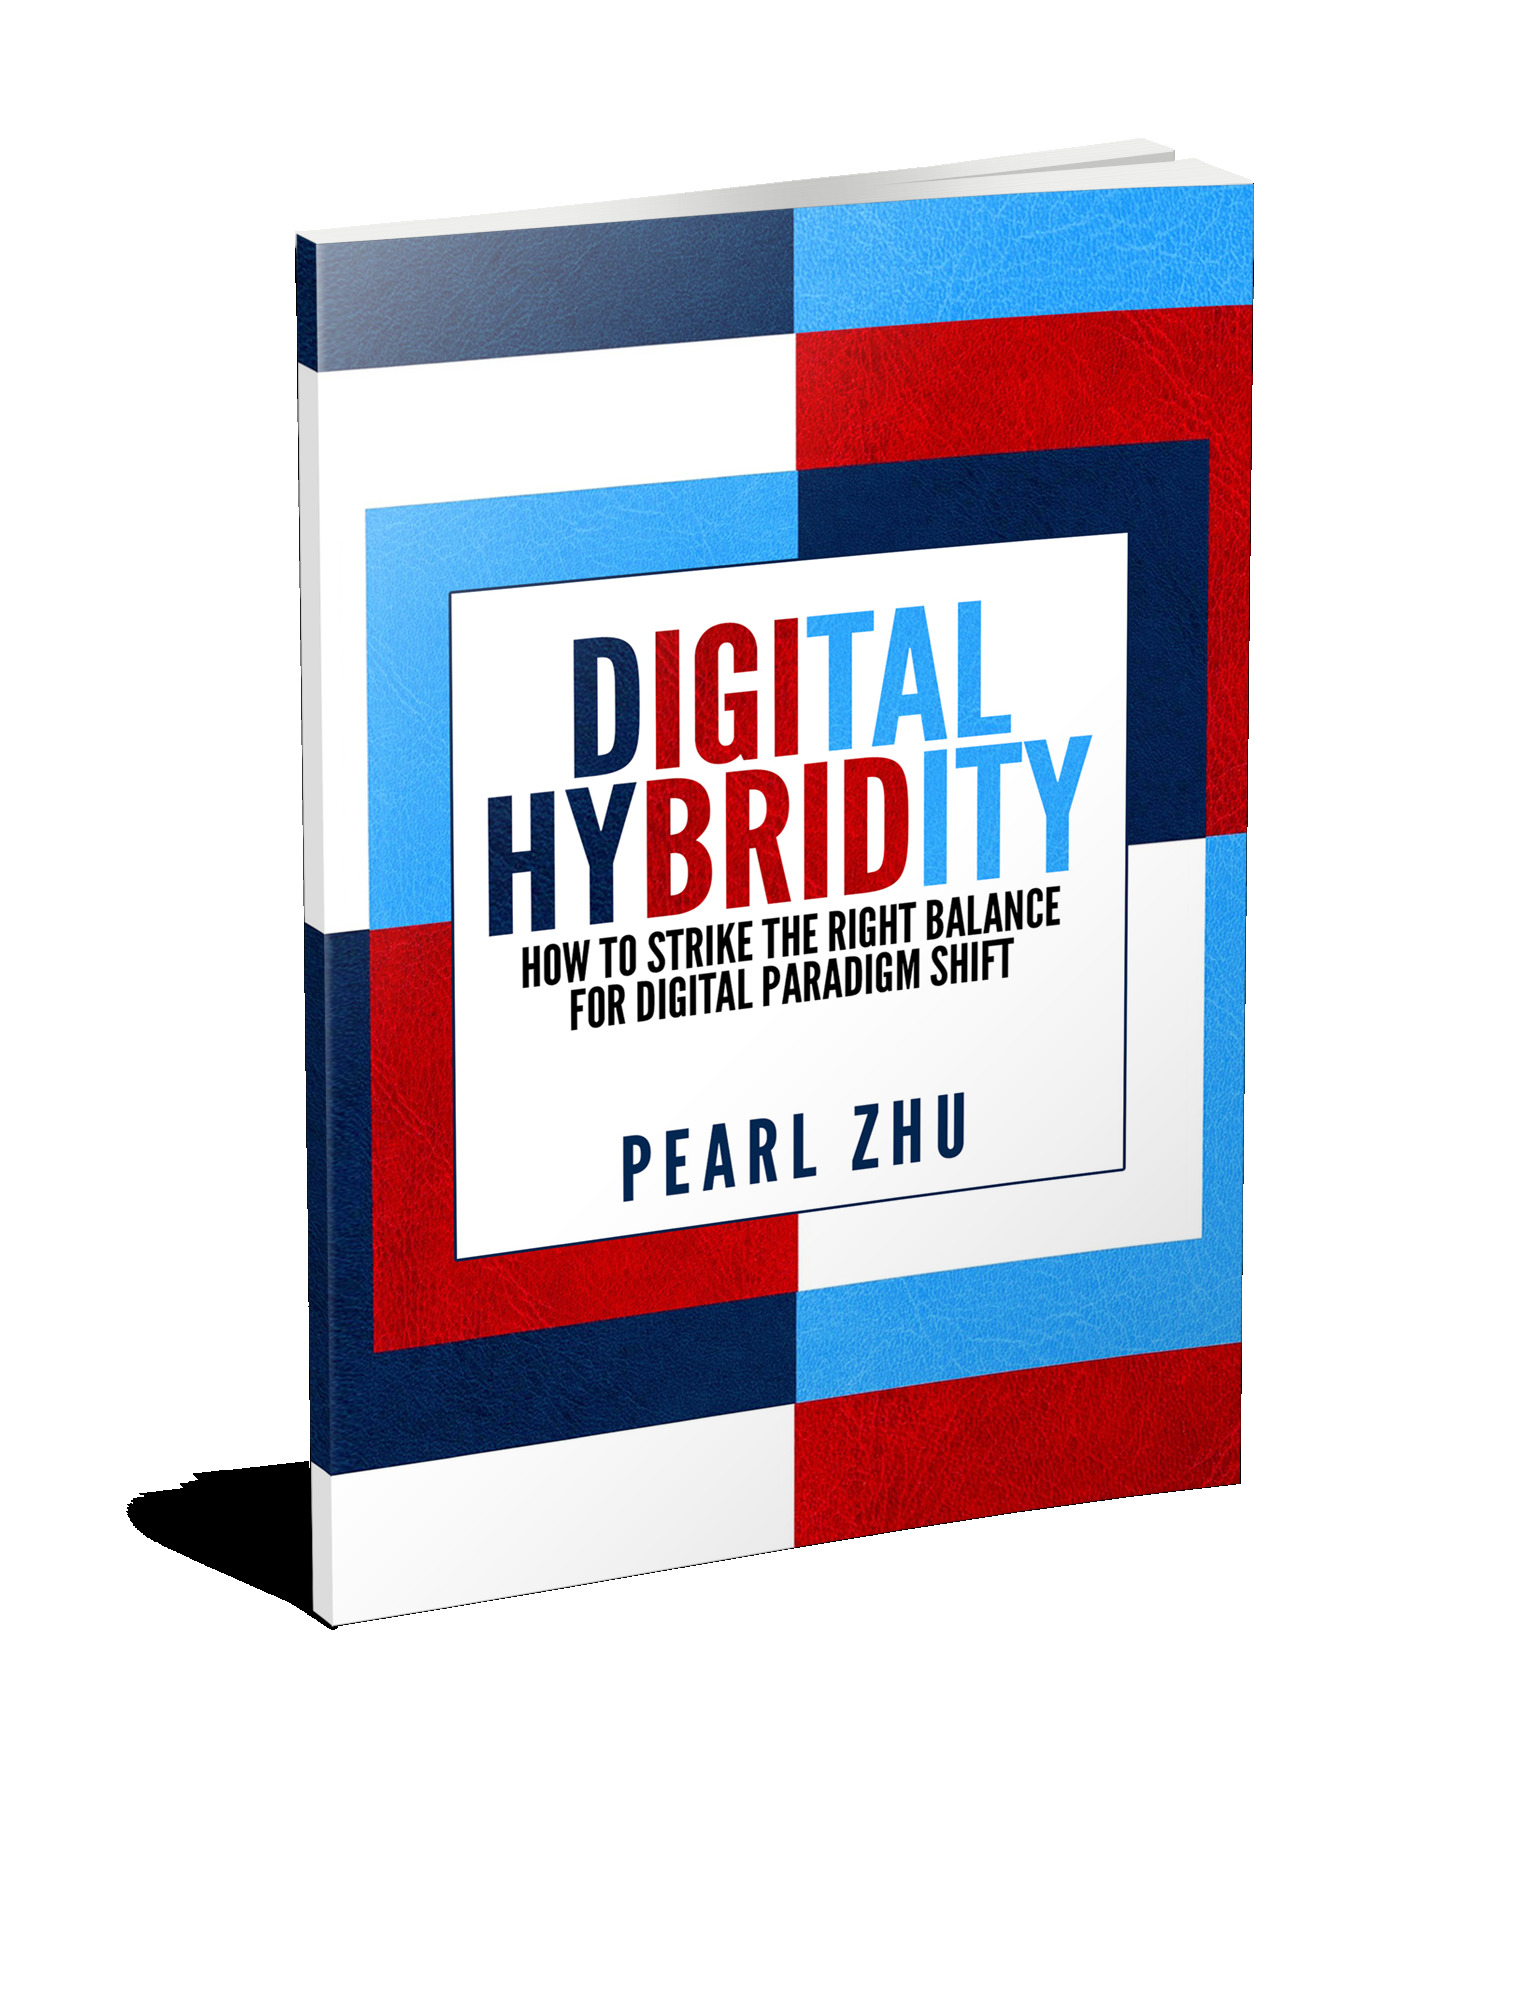 Digital Hybridity